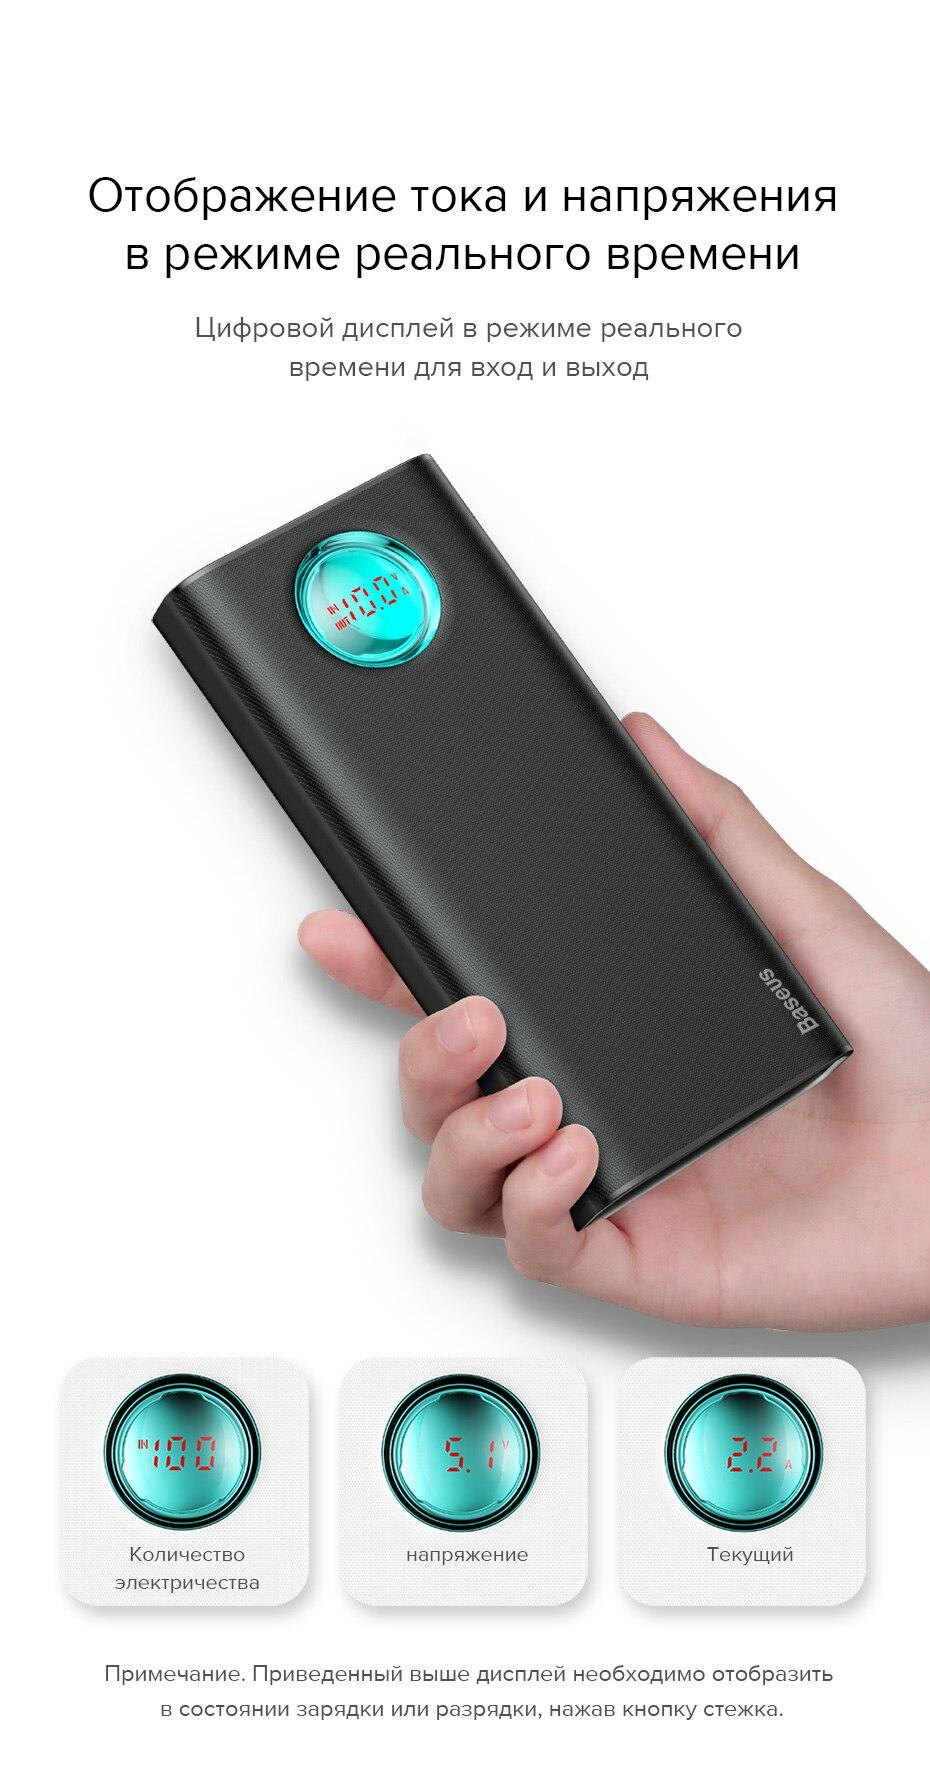 Baseus 20000 мАч Внешний аккумулятор для iPhone samsung huawei type C PD Быстрая зарядка+ быстрая зарядка 3,0 USB внешний аккумулятор